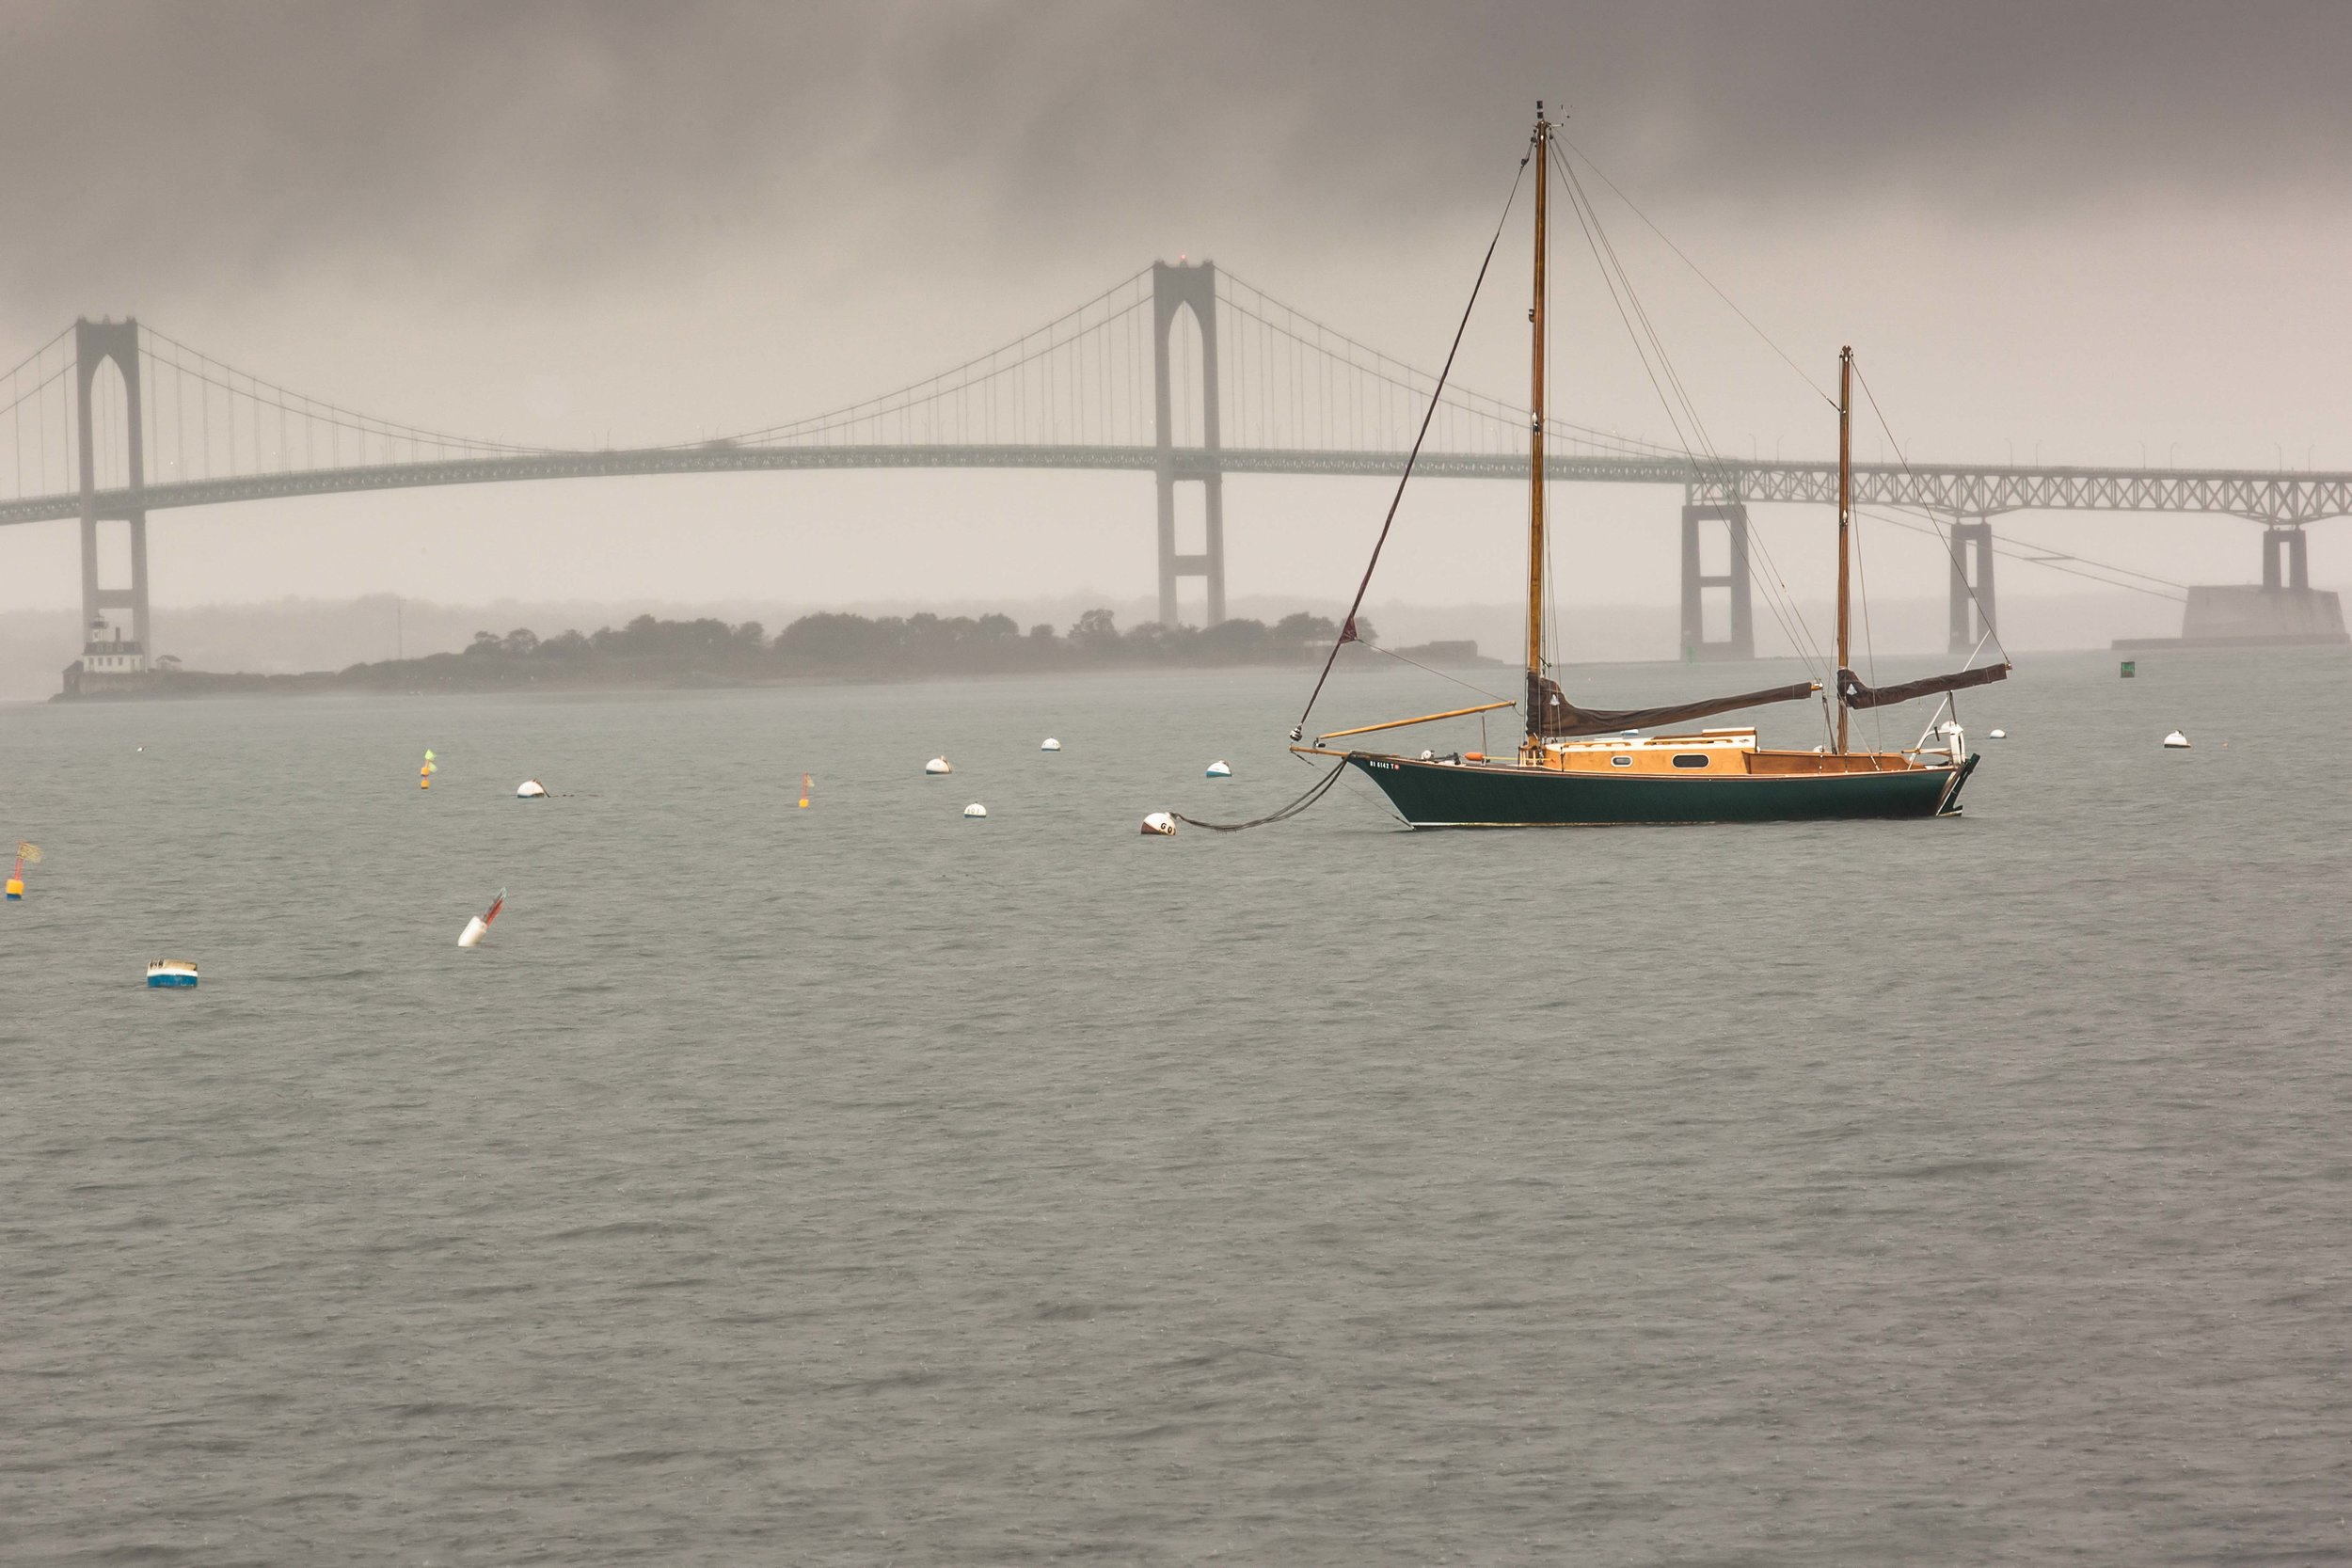 newportsailboat1final1.jpg